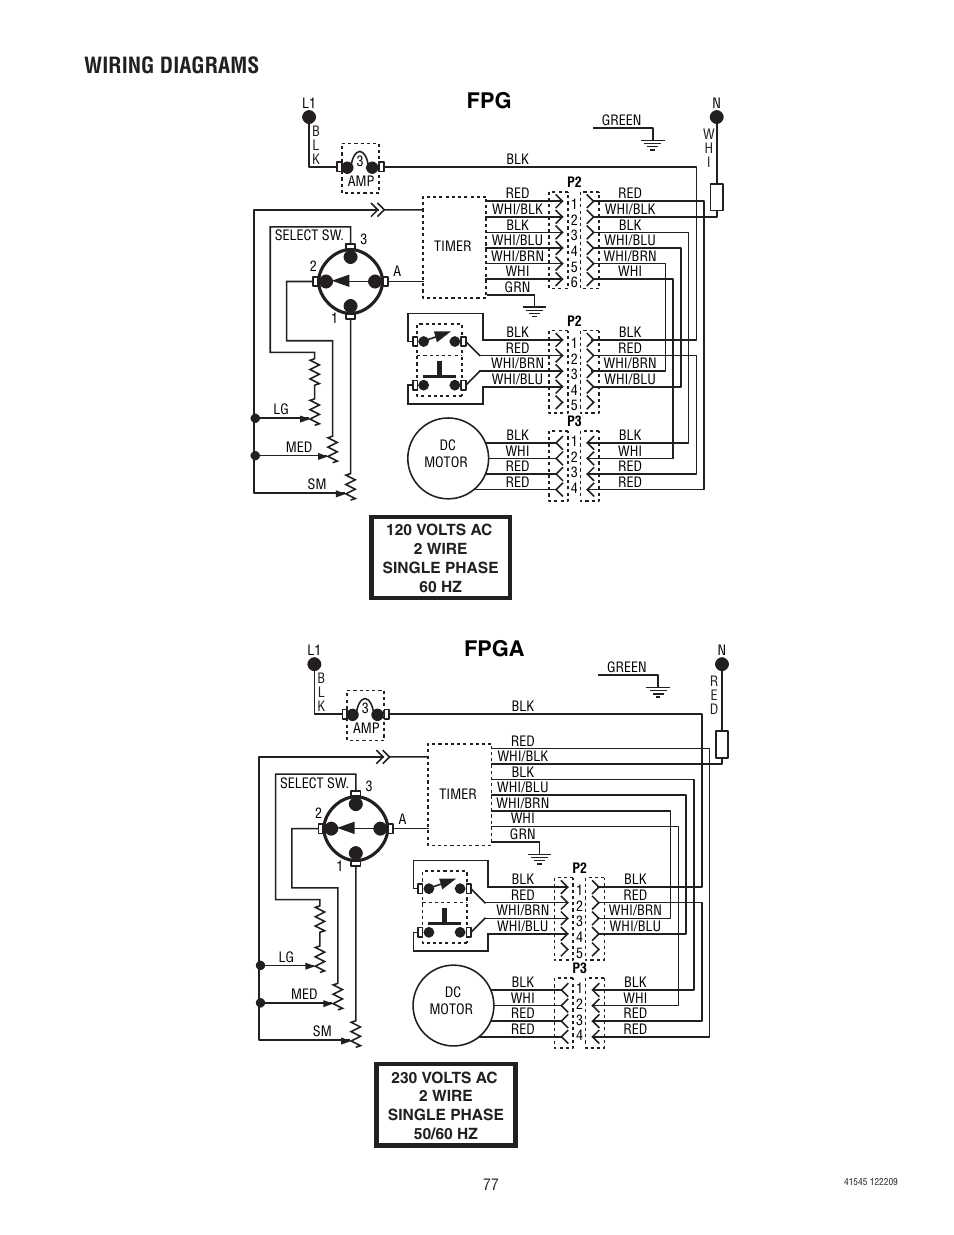 Baldor Generator Wiring Diagrams Auto Electrical Diagram Panasonic Cq C5405u Single Phase Within